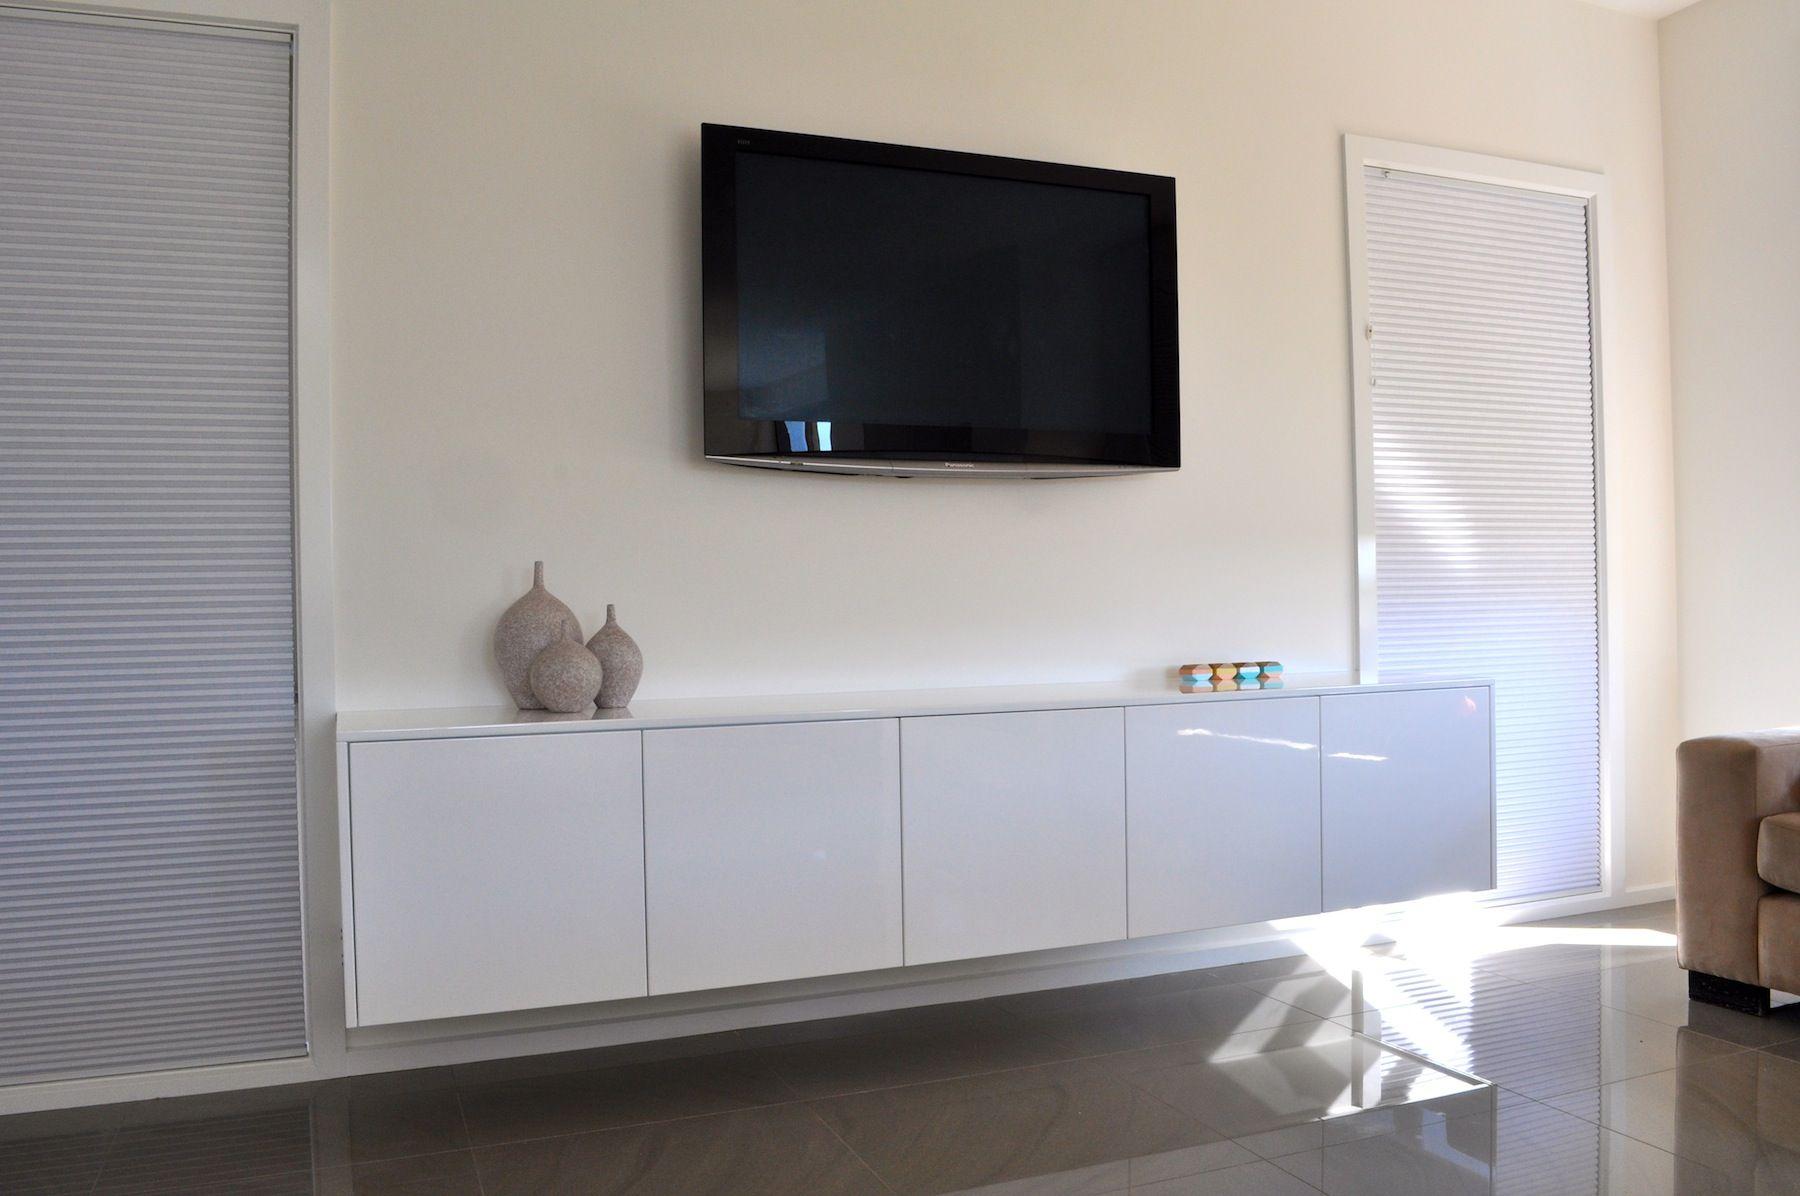 Floating TV Cabinet by Zing Furniture! #wallmounted #tvcabinet #zingfurniture